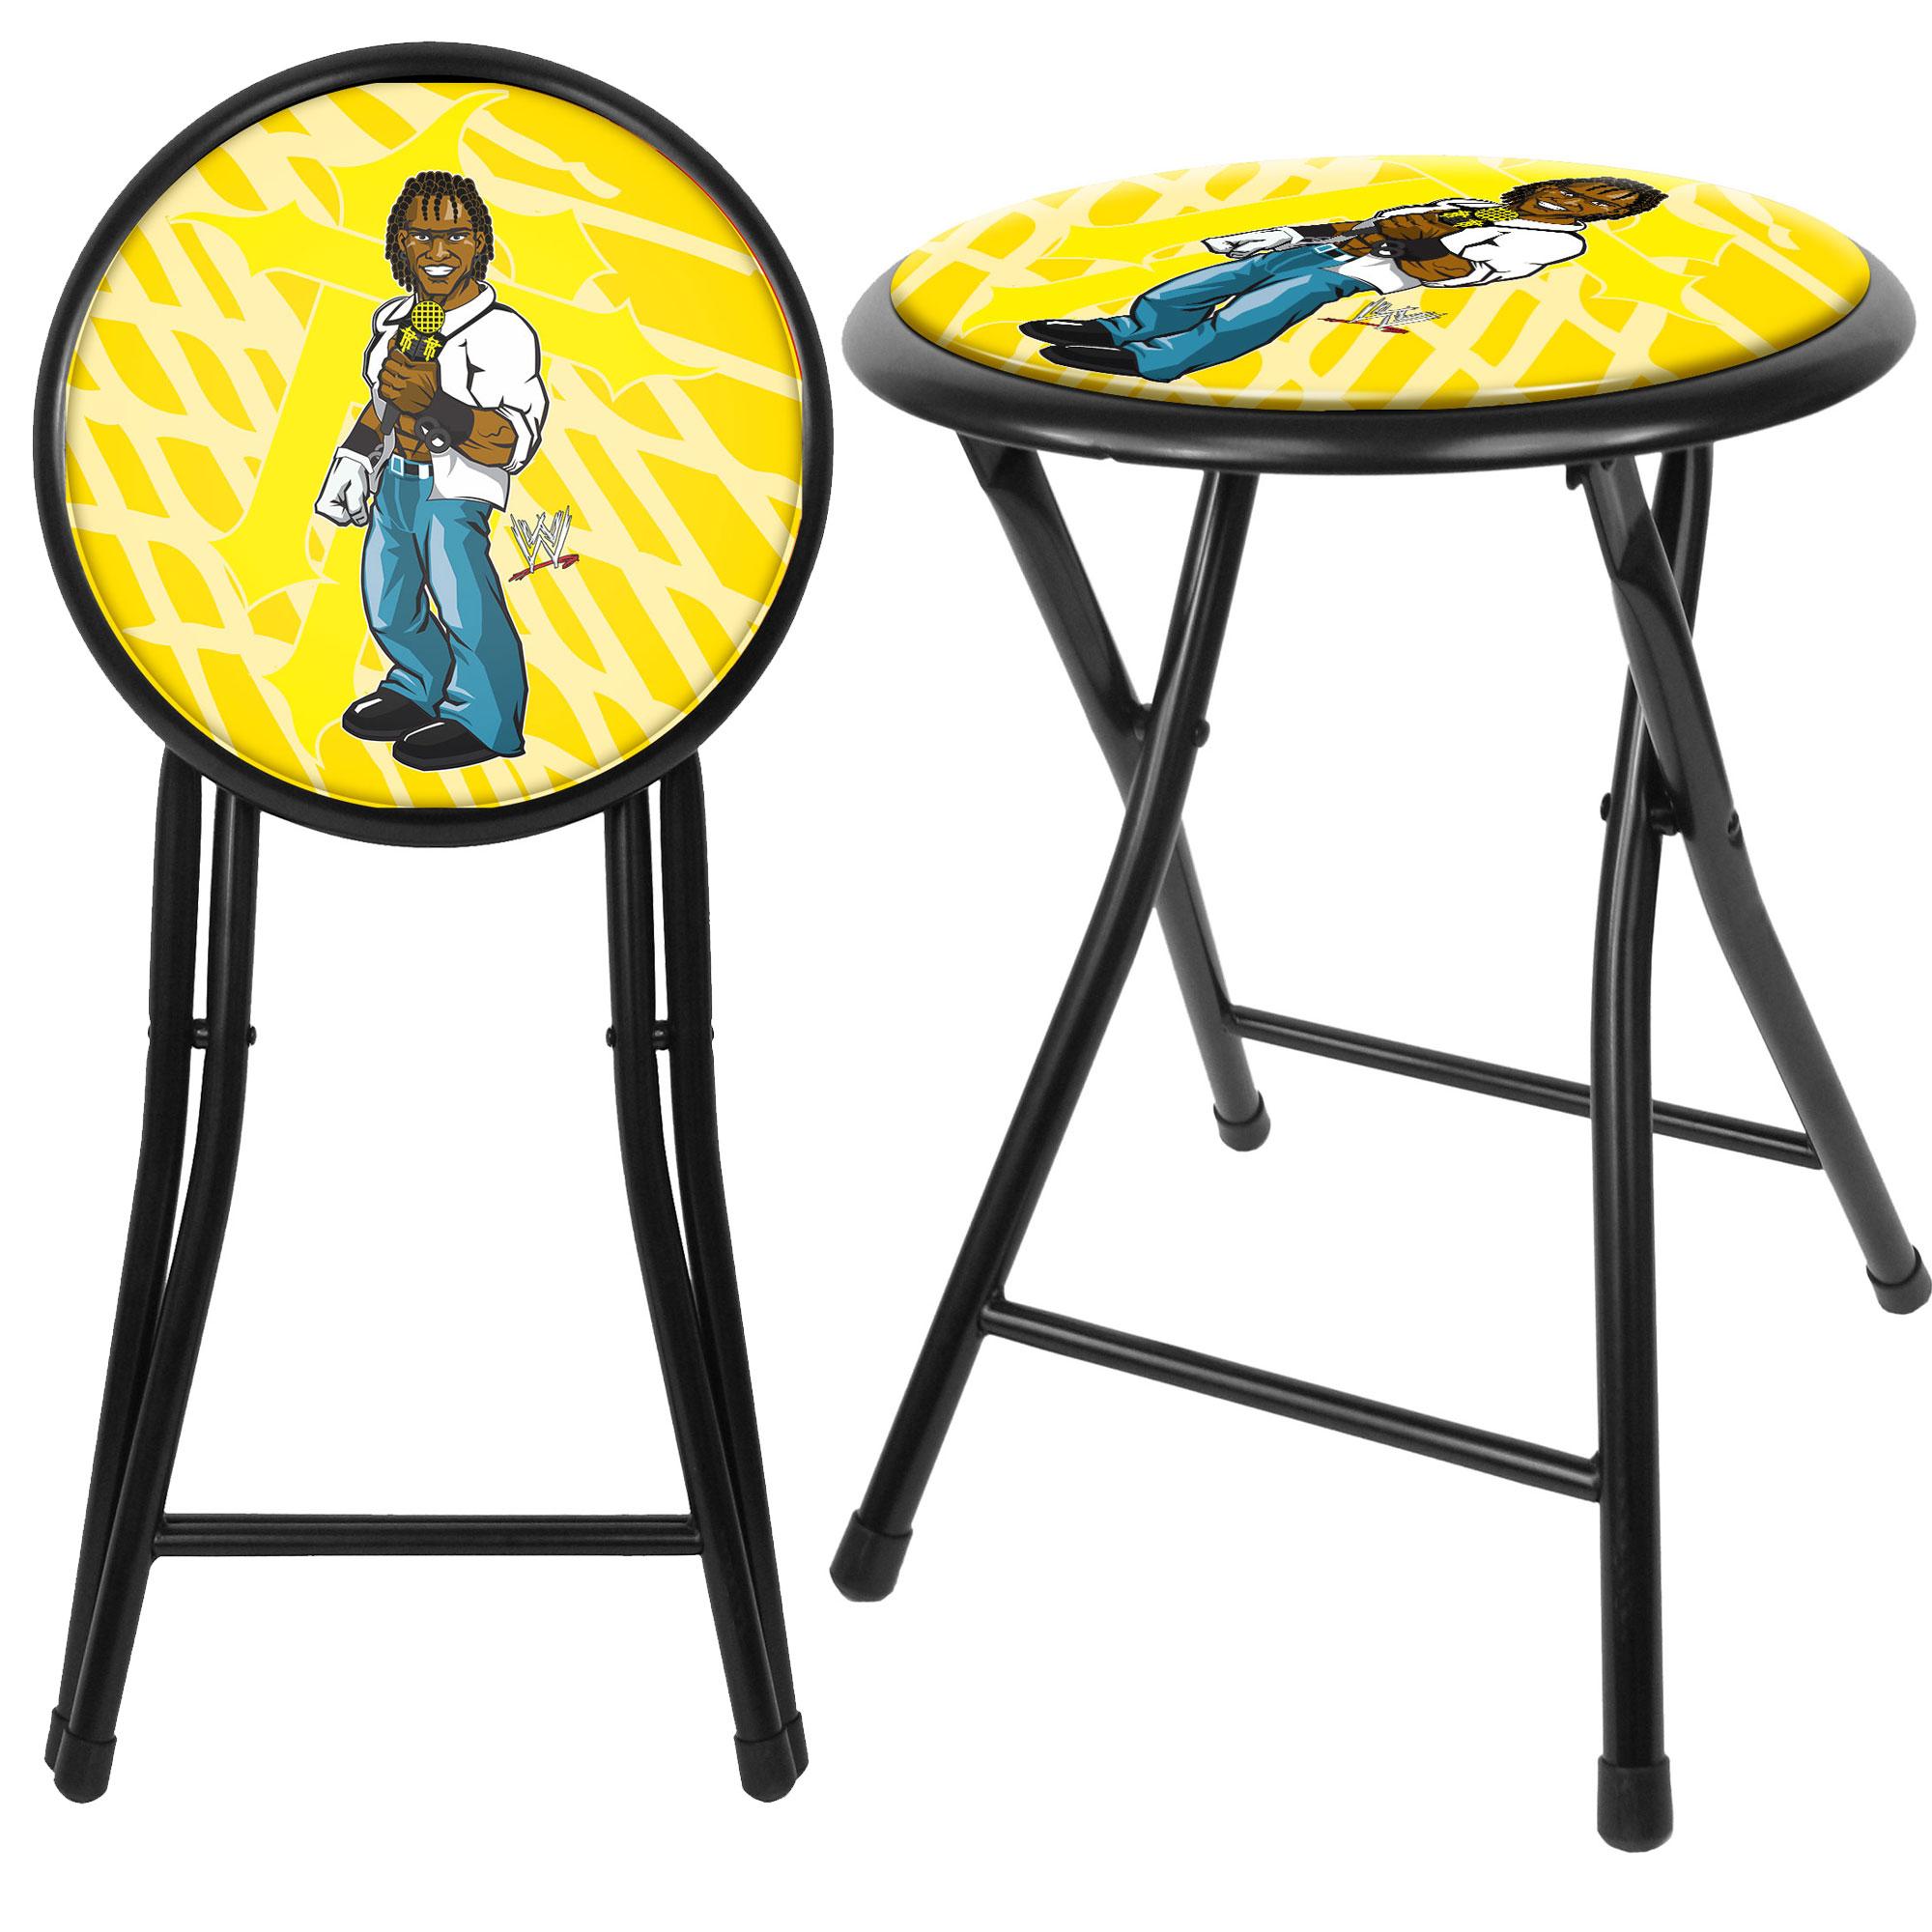 steel chair in wwe wicker seat pad trademark global kids r truth 18 inch folding stool